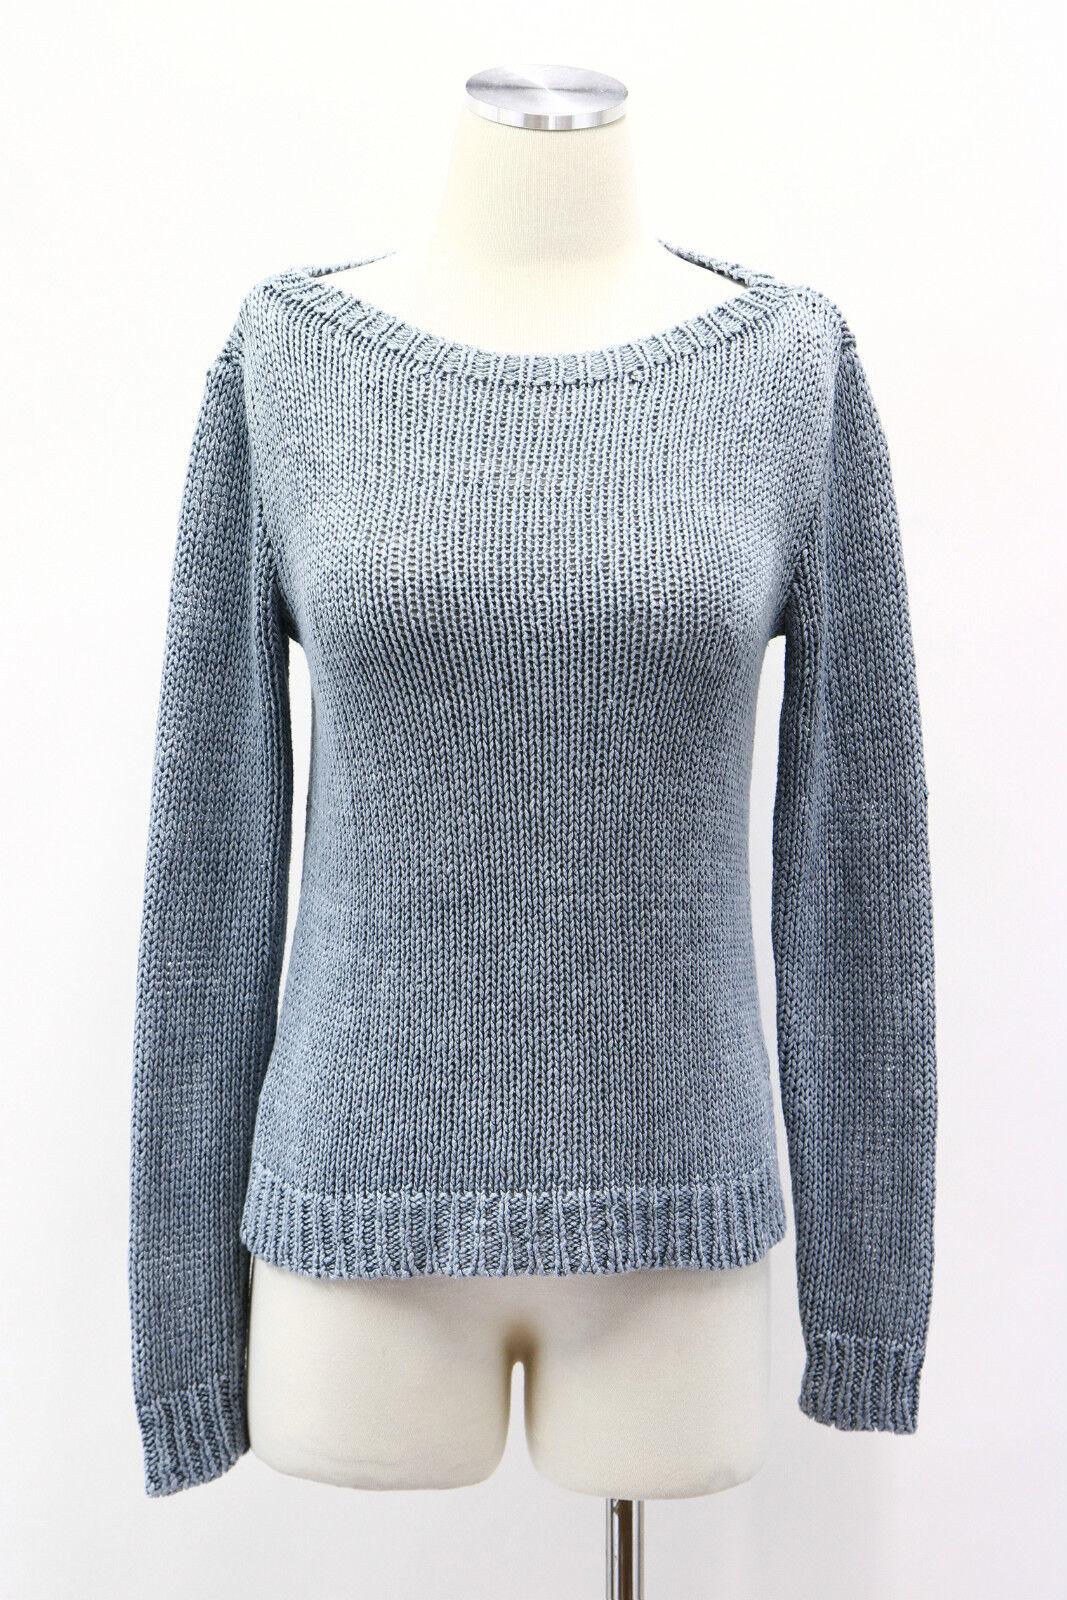 NWT  498 Ralph Lauren Women's 100% 100% 100% Linen Pastel bluee Cable Knit Sweater Size S 6fb200